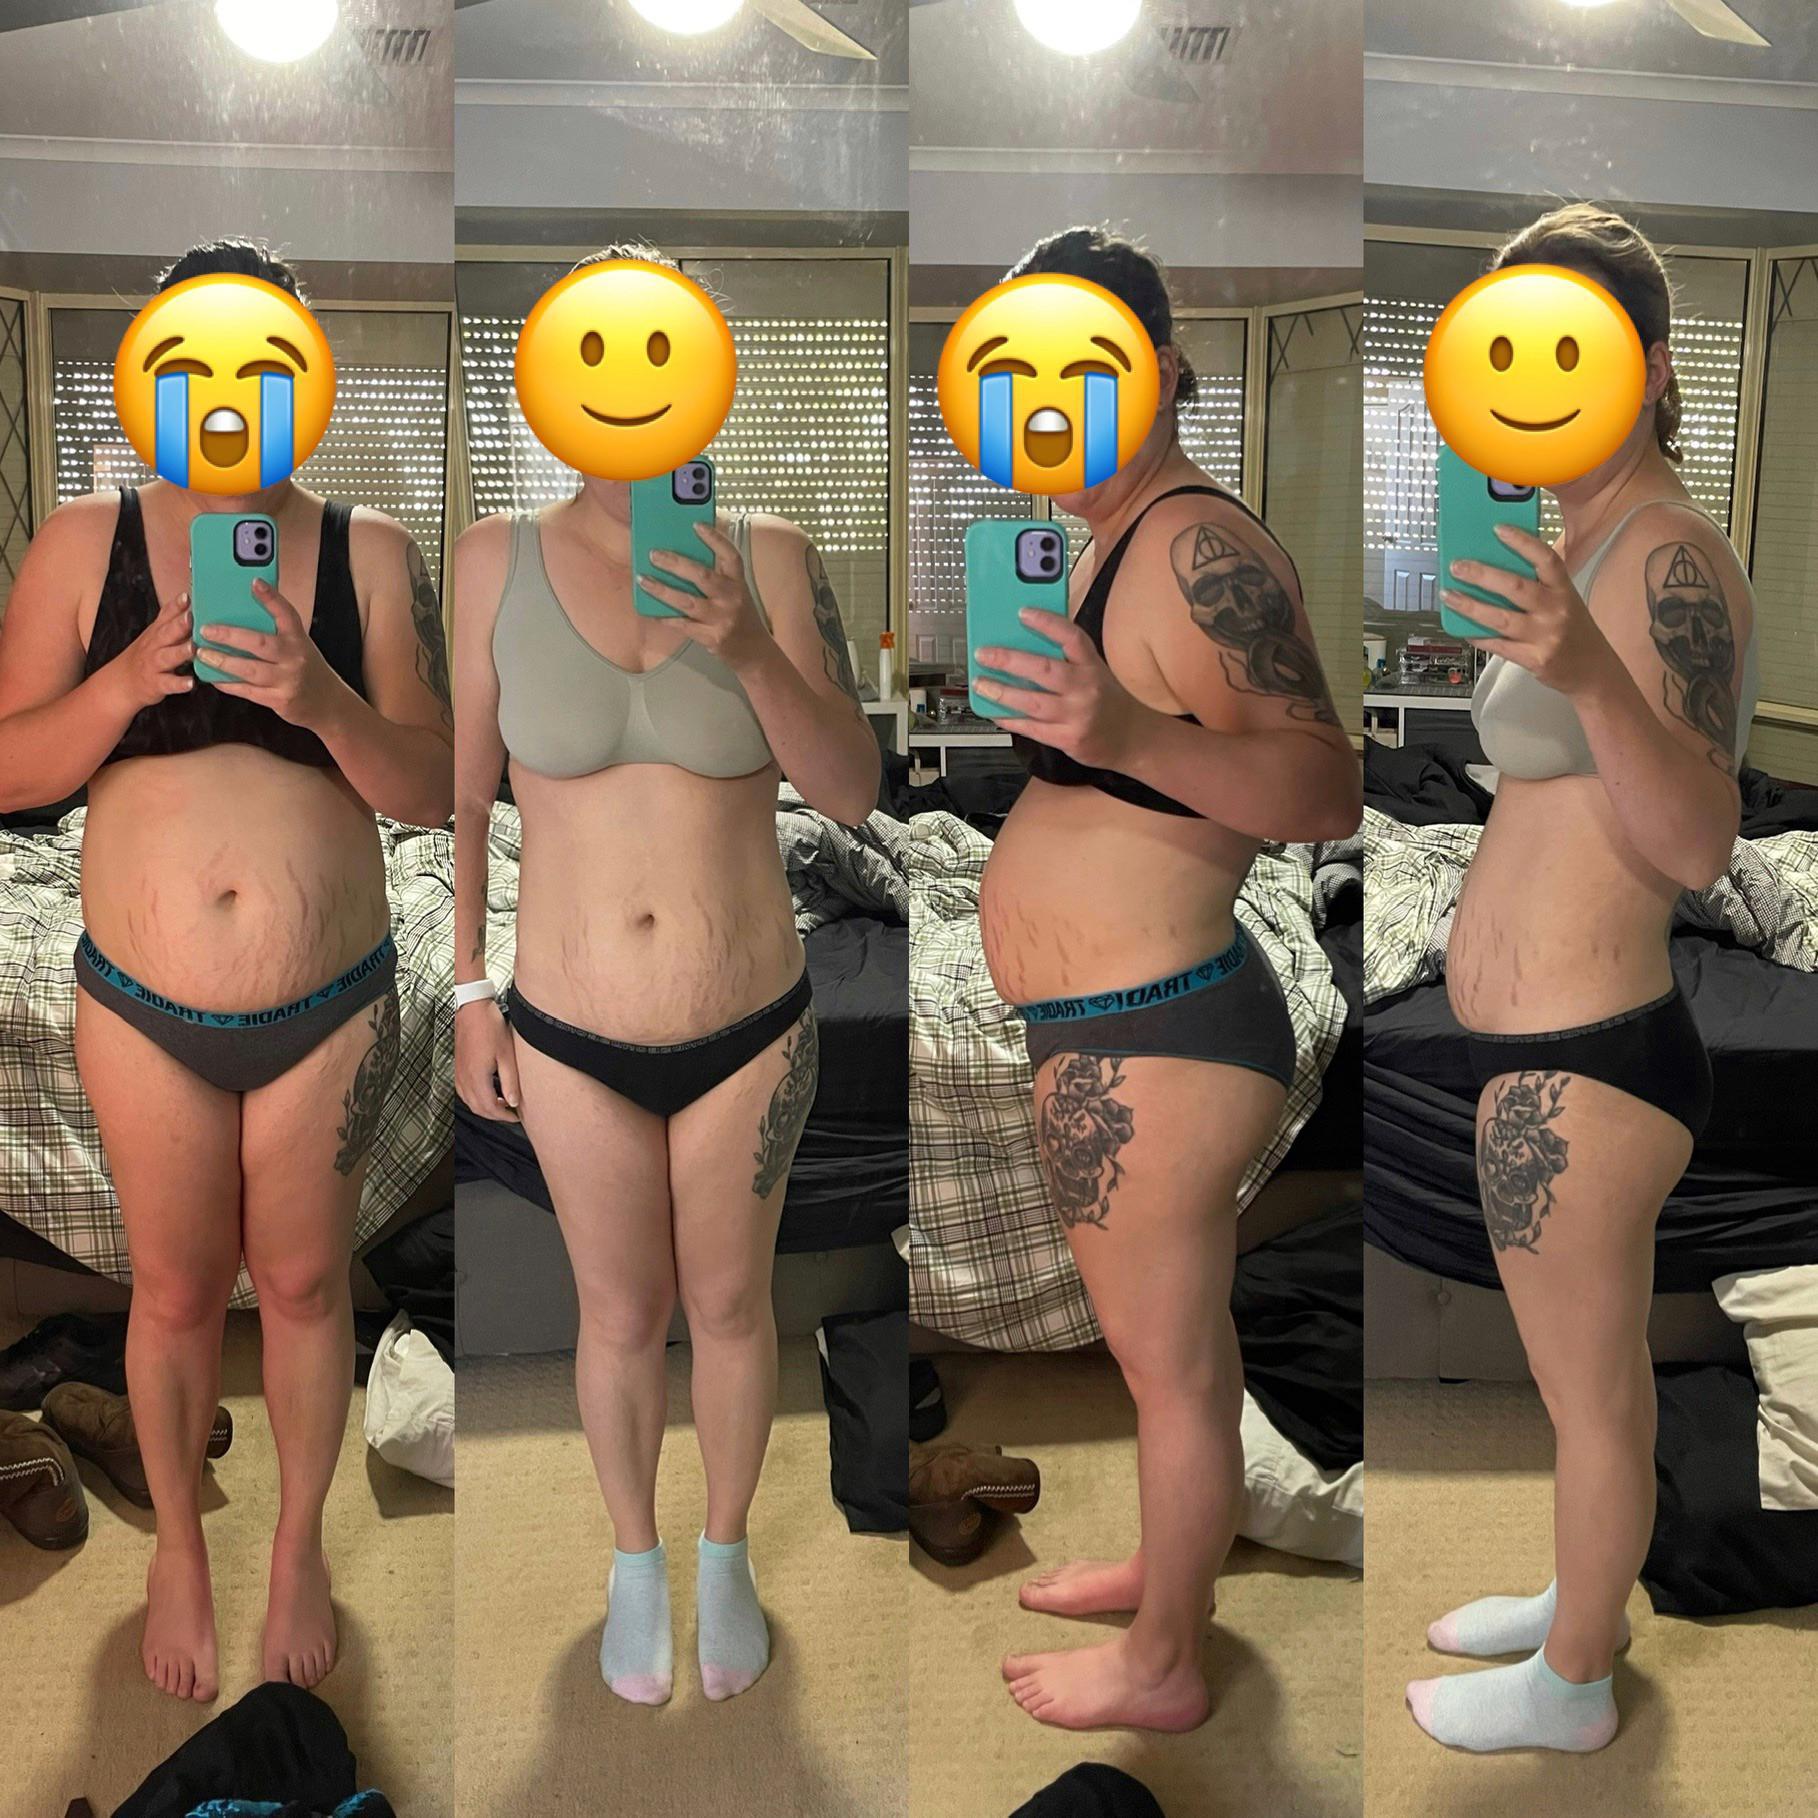 5'5 Female Progress Pics of 29 lbs Weight Loss 186 lbs to 157 lbs